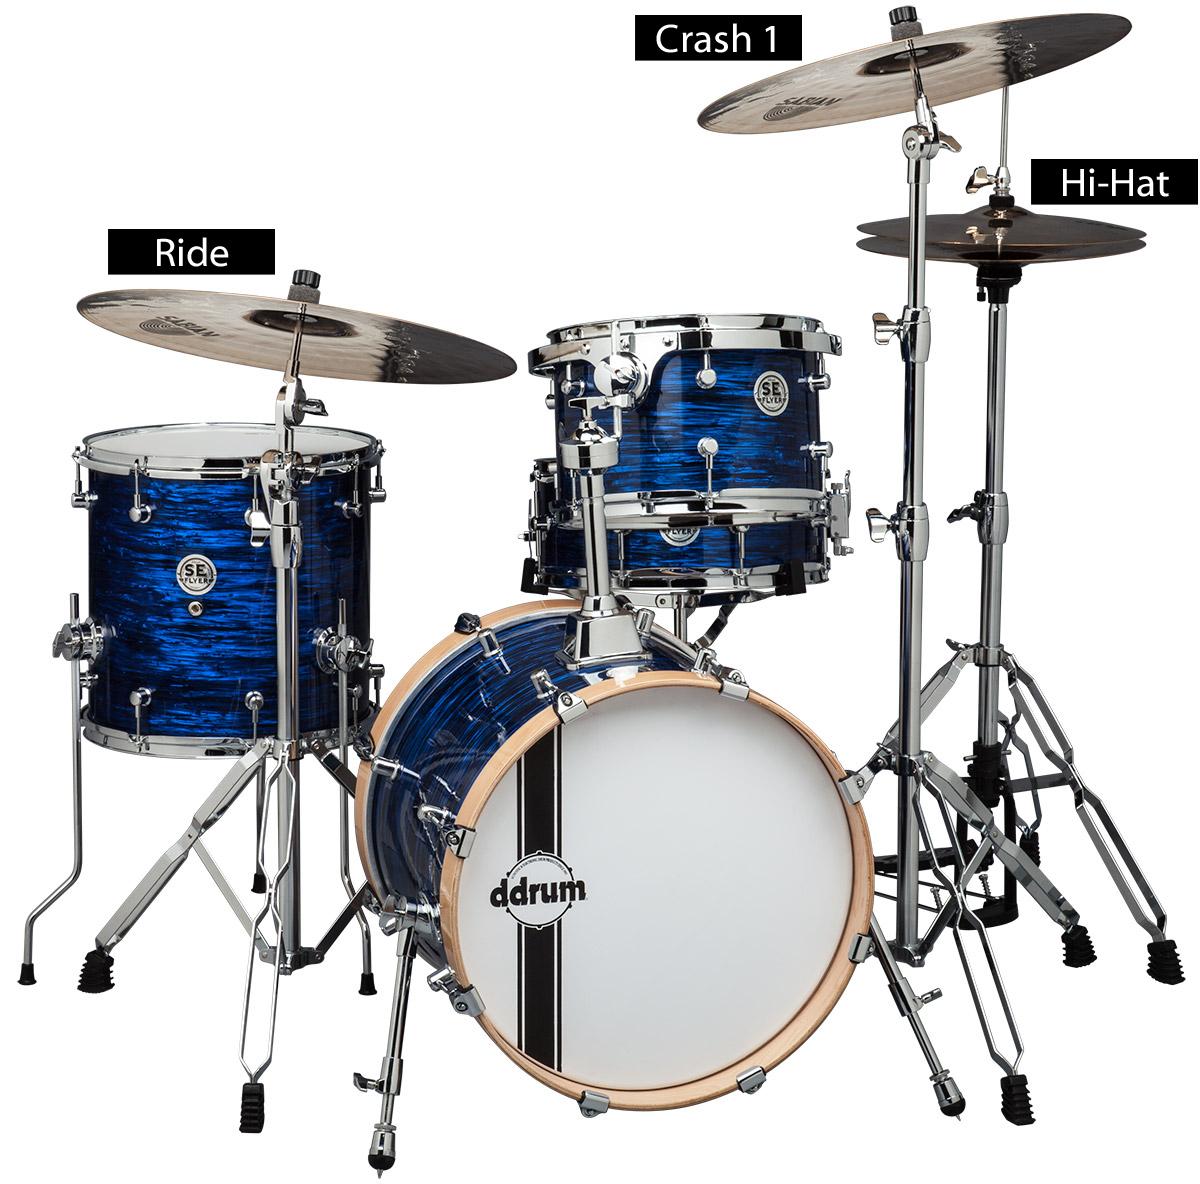 Drum Notation Key Drum Legend Onlinedrummer Com